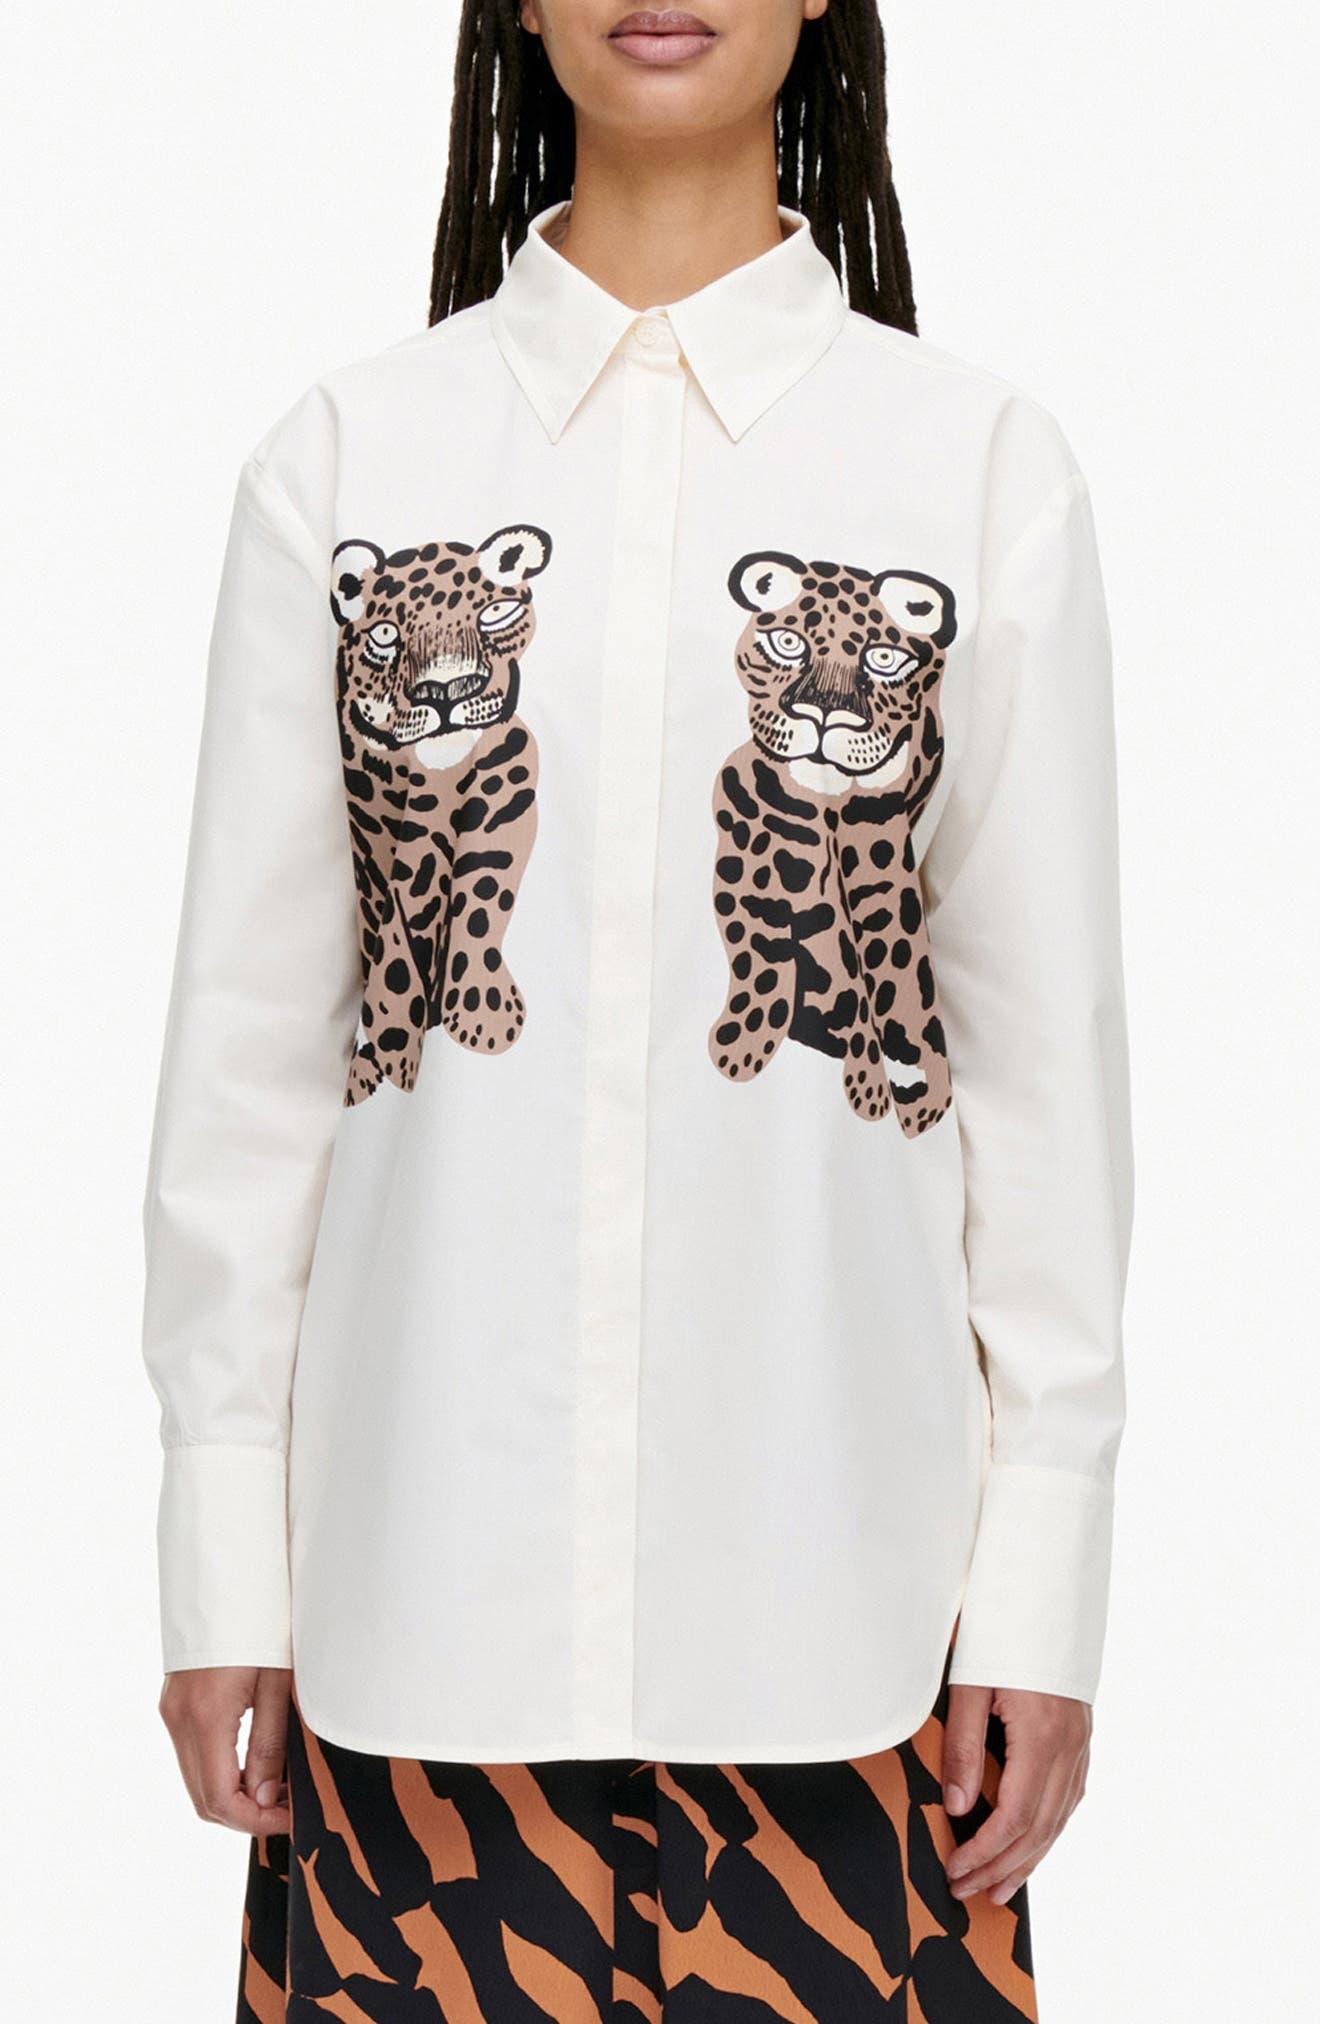 Haavikko Kaksoset Button-Up Shirt